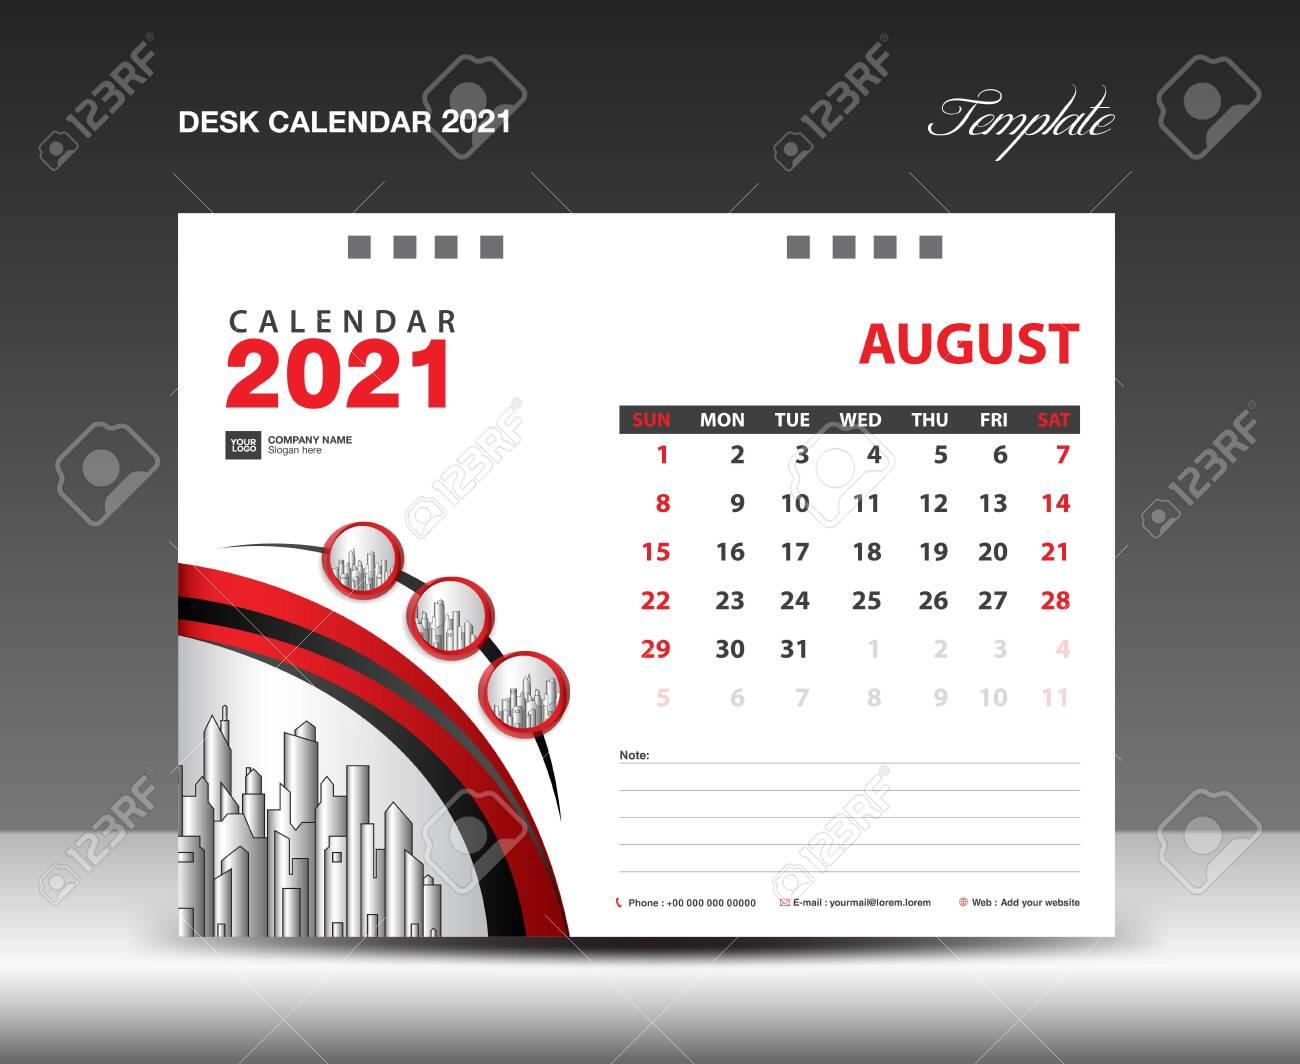 2021 Calendar Design. August 2021 Template. Desk Calendar Page